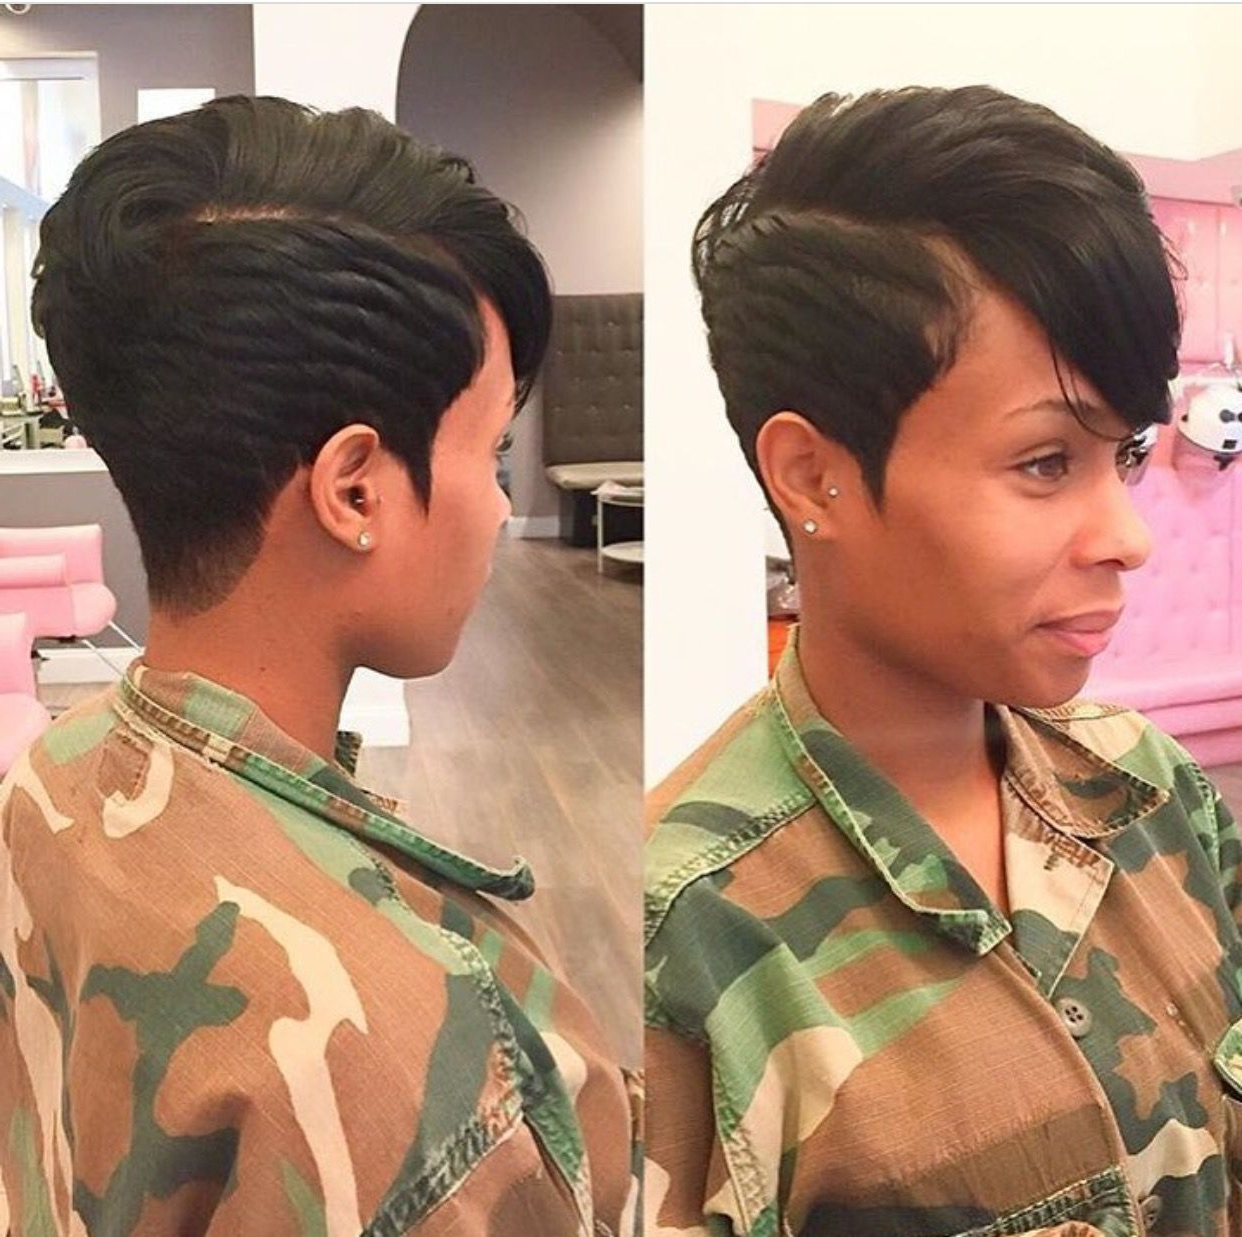 Pincandice Crayton On Hair In 2018 | Pinterest | Short Hair For Short Haircuts For Black Hair (View 12 of 25)